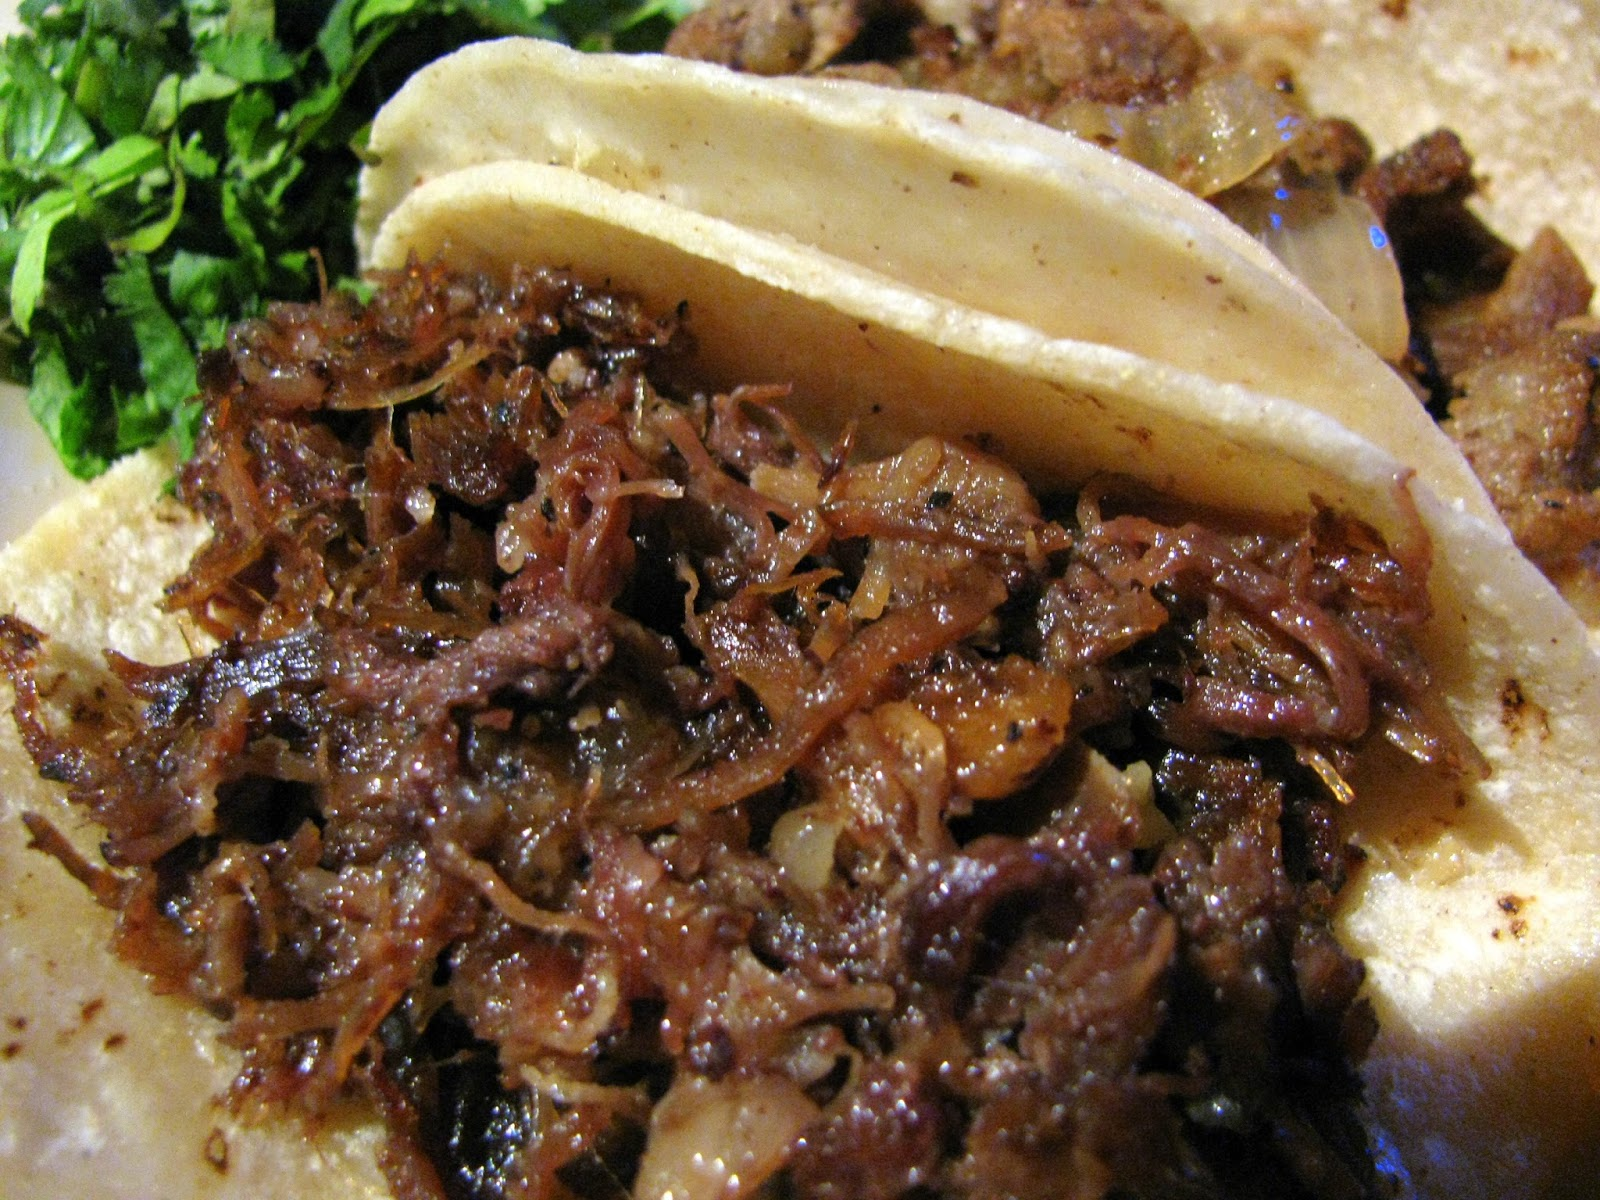 EL RRUN RRUN: HEADS ROLL AT BISD BECAUSE OF SPOILED BARBACOA MEAT